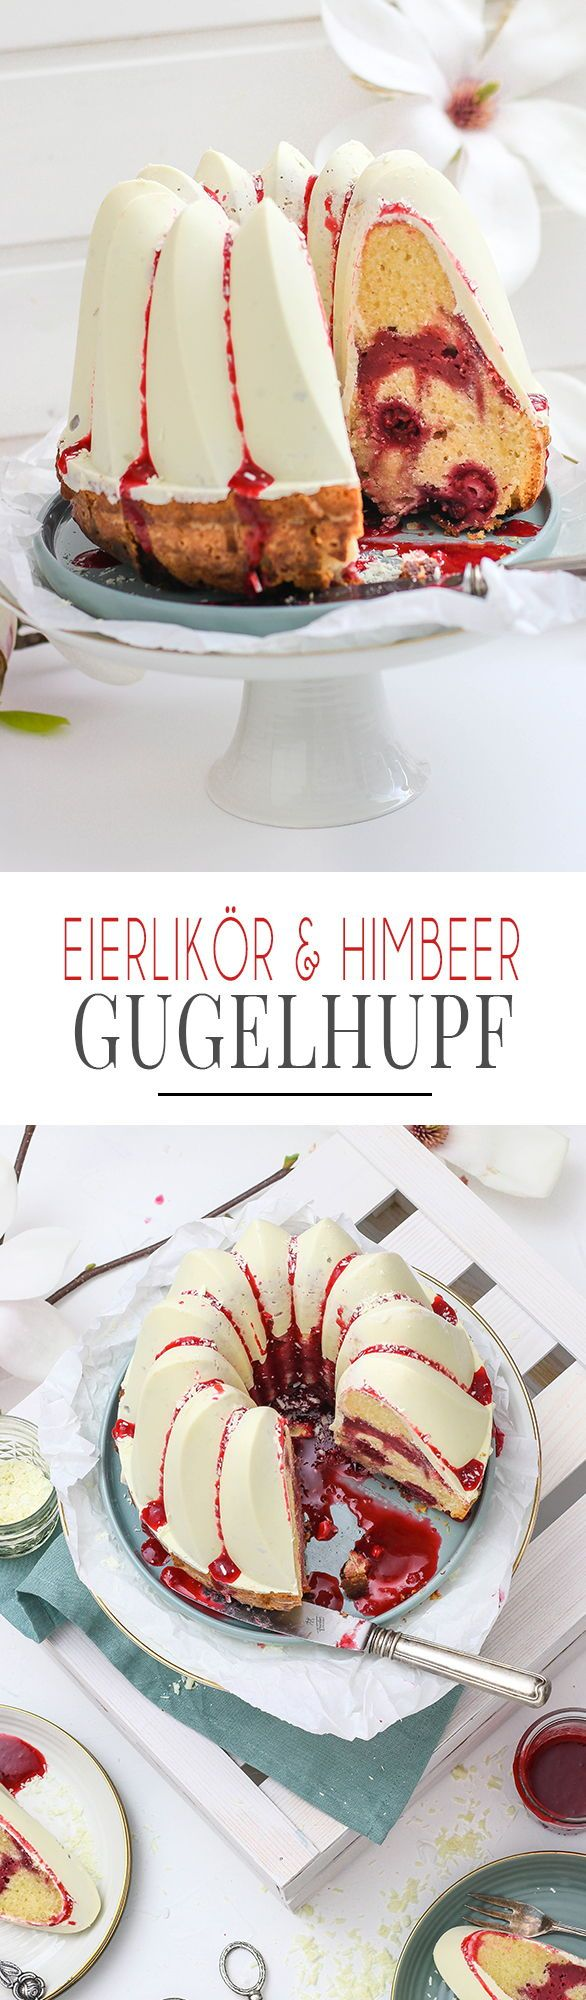 Last Minute Easter Eggnog Himbeer-Pound-Cake mit weißer Schokoladenglasur, Himbeer …   – Food: KüchenDeern Rezepte